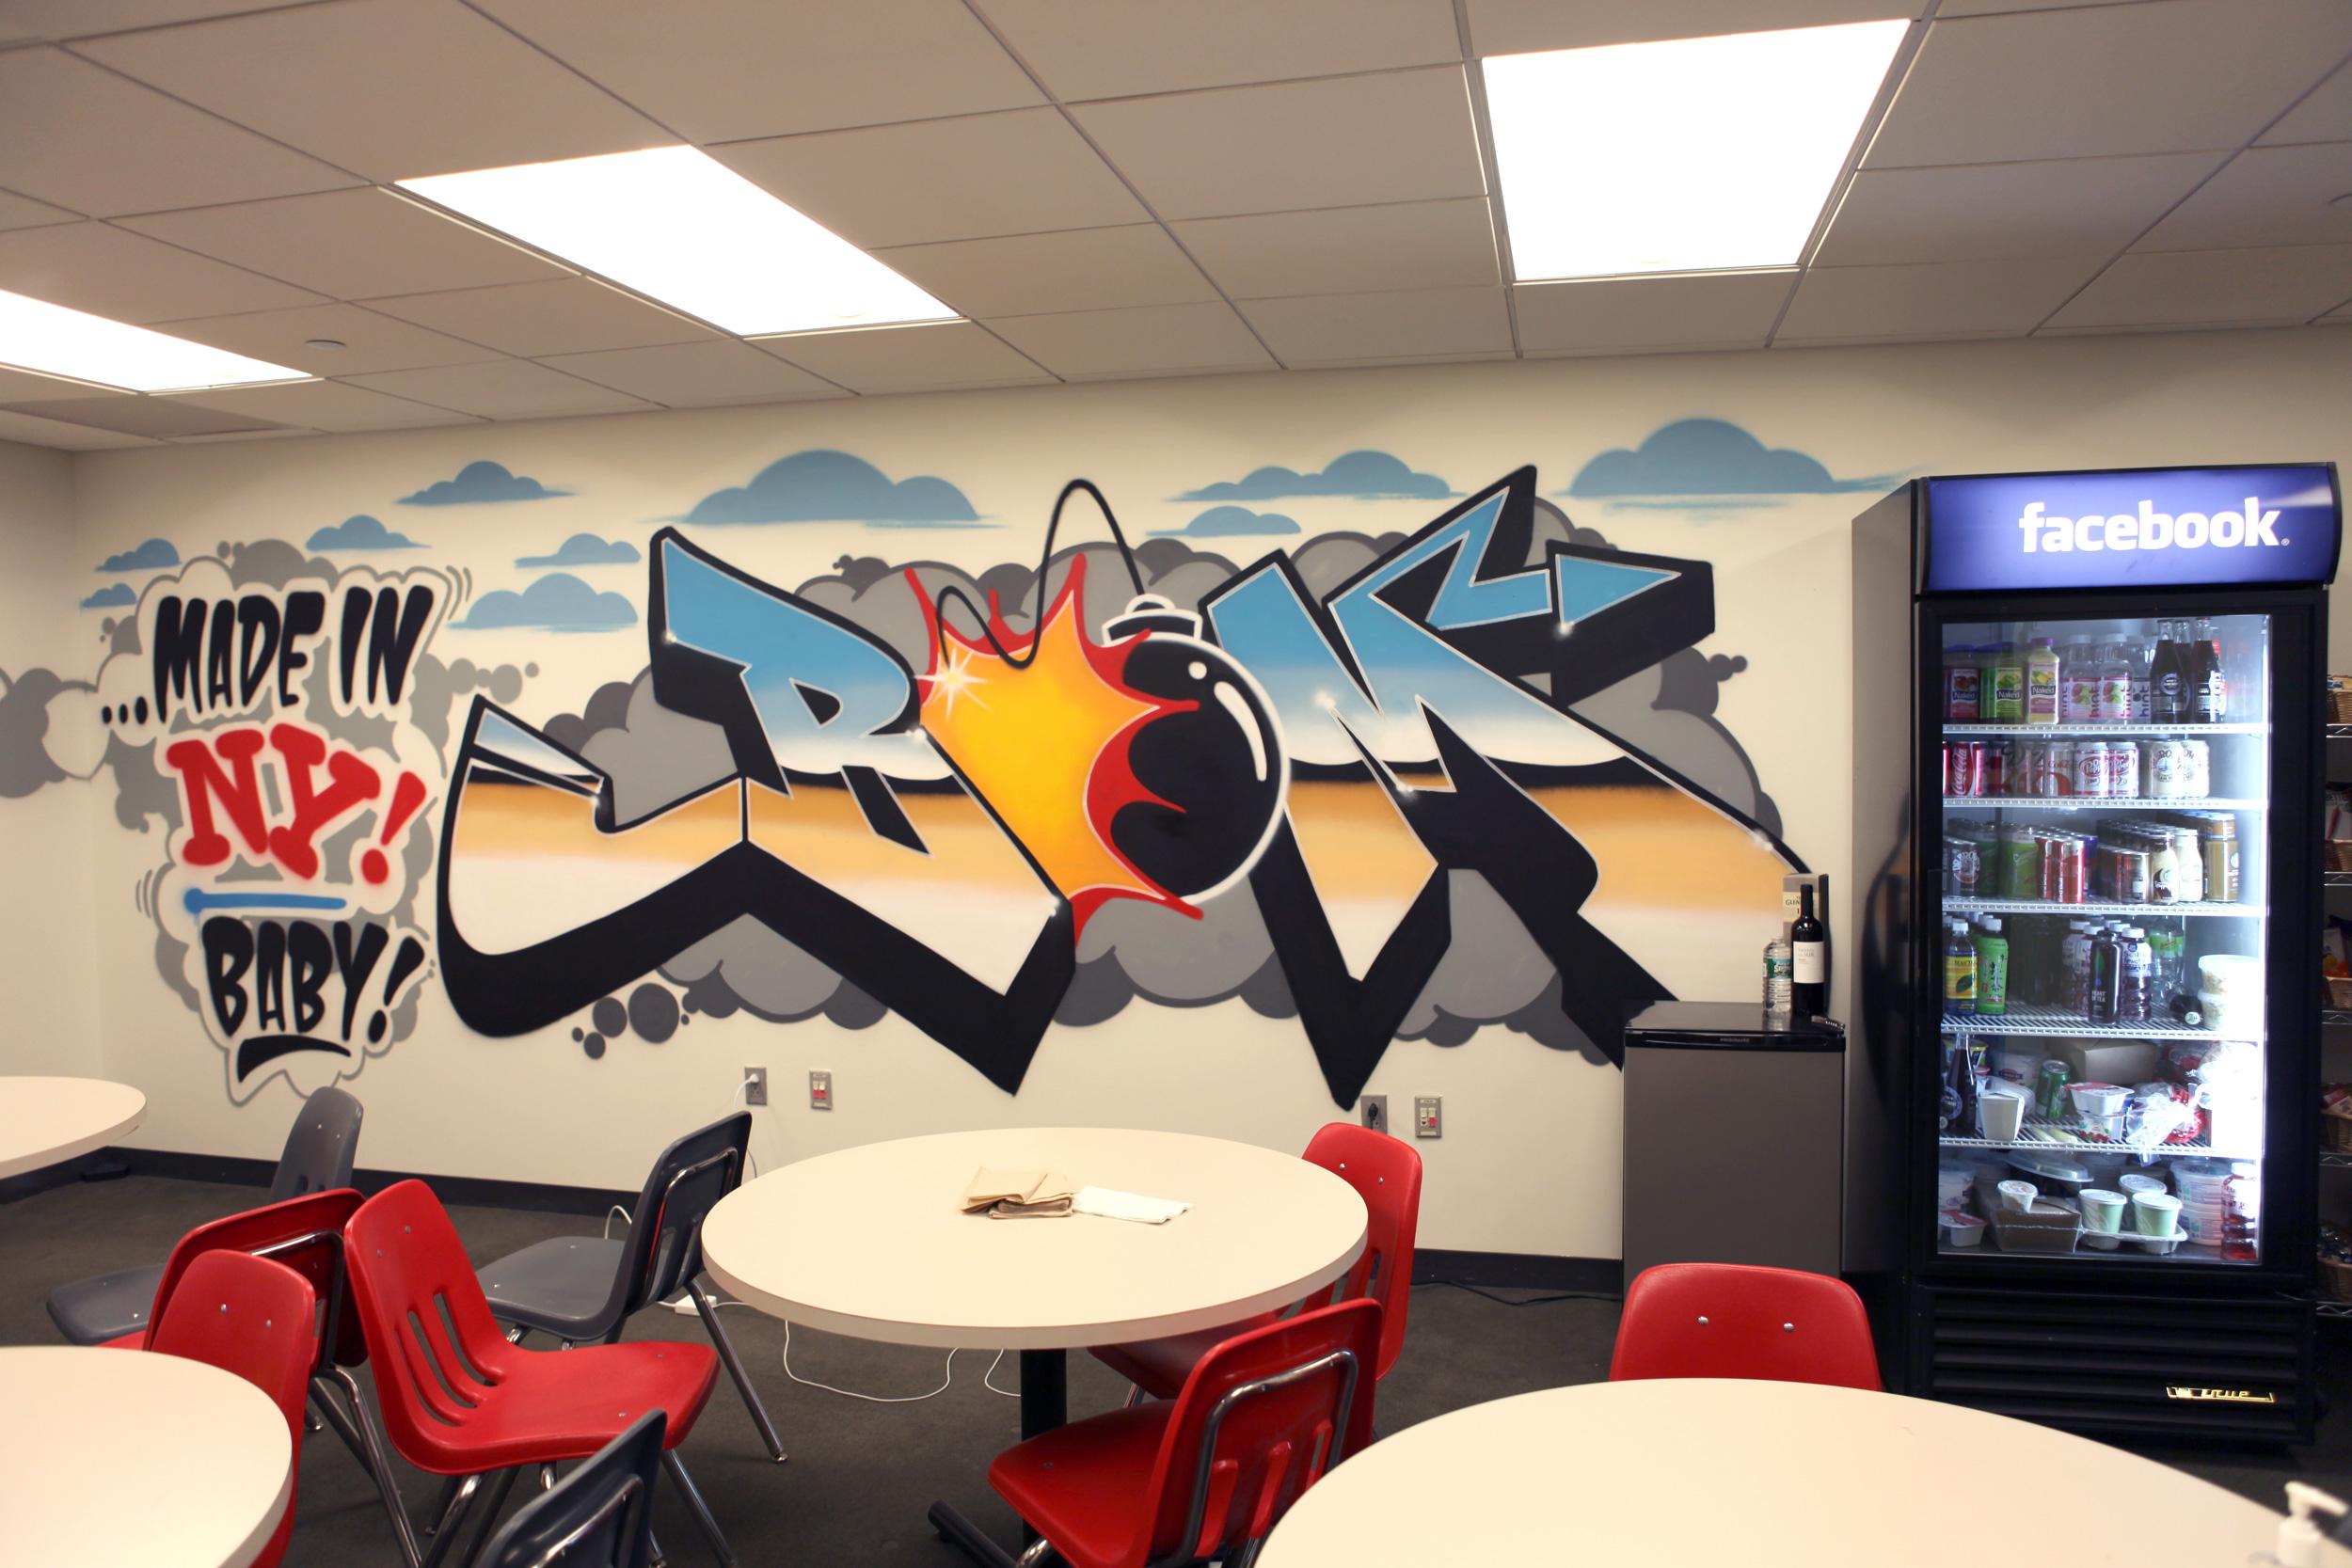 New York Facebook Office Graffiti Art